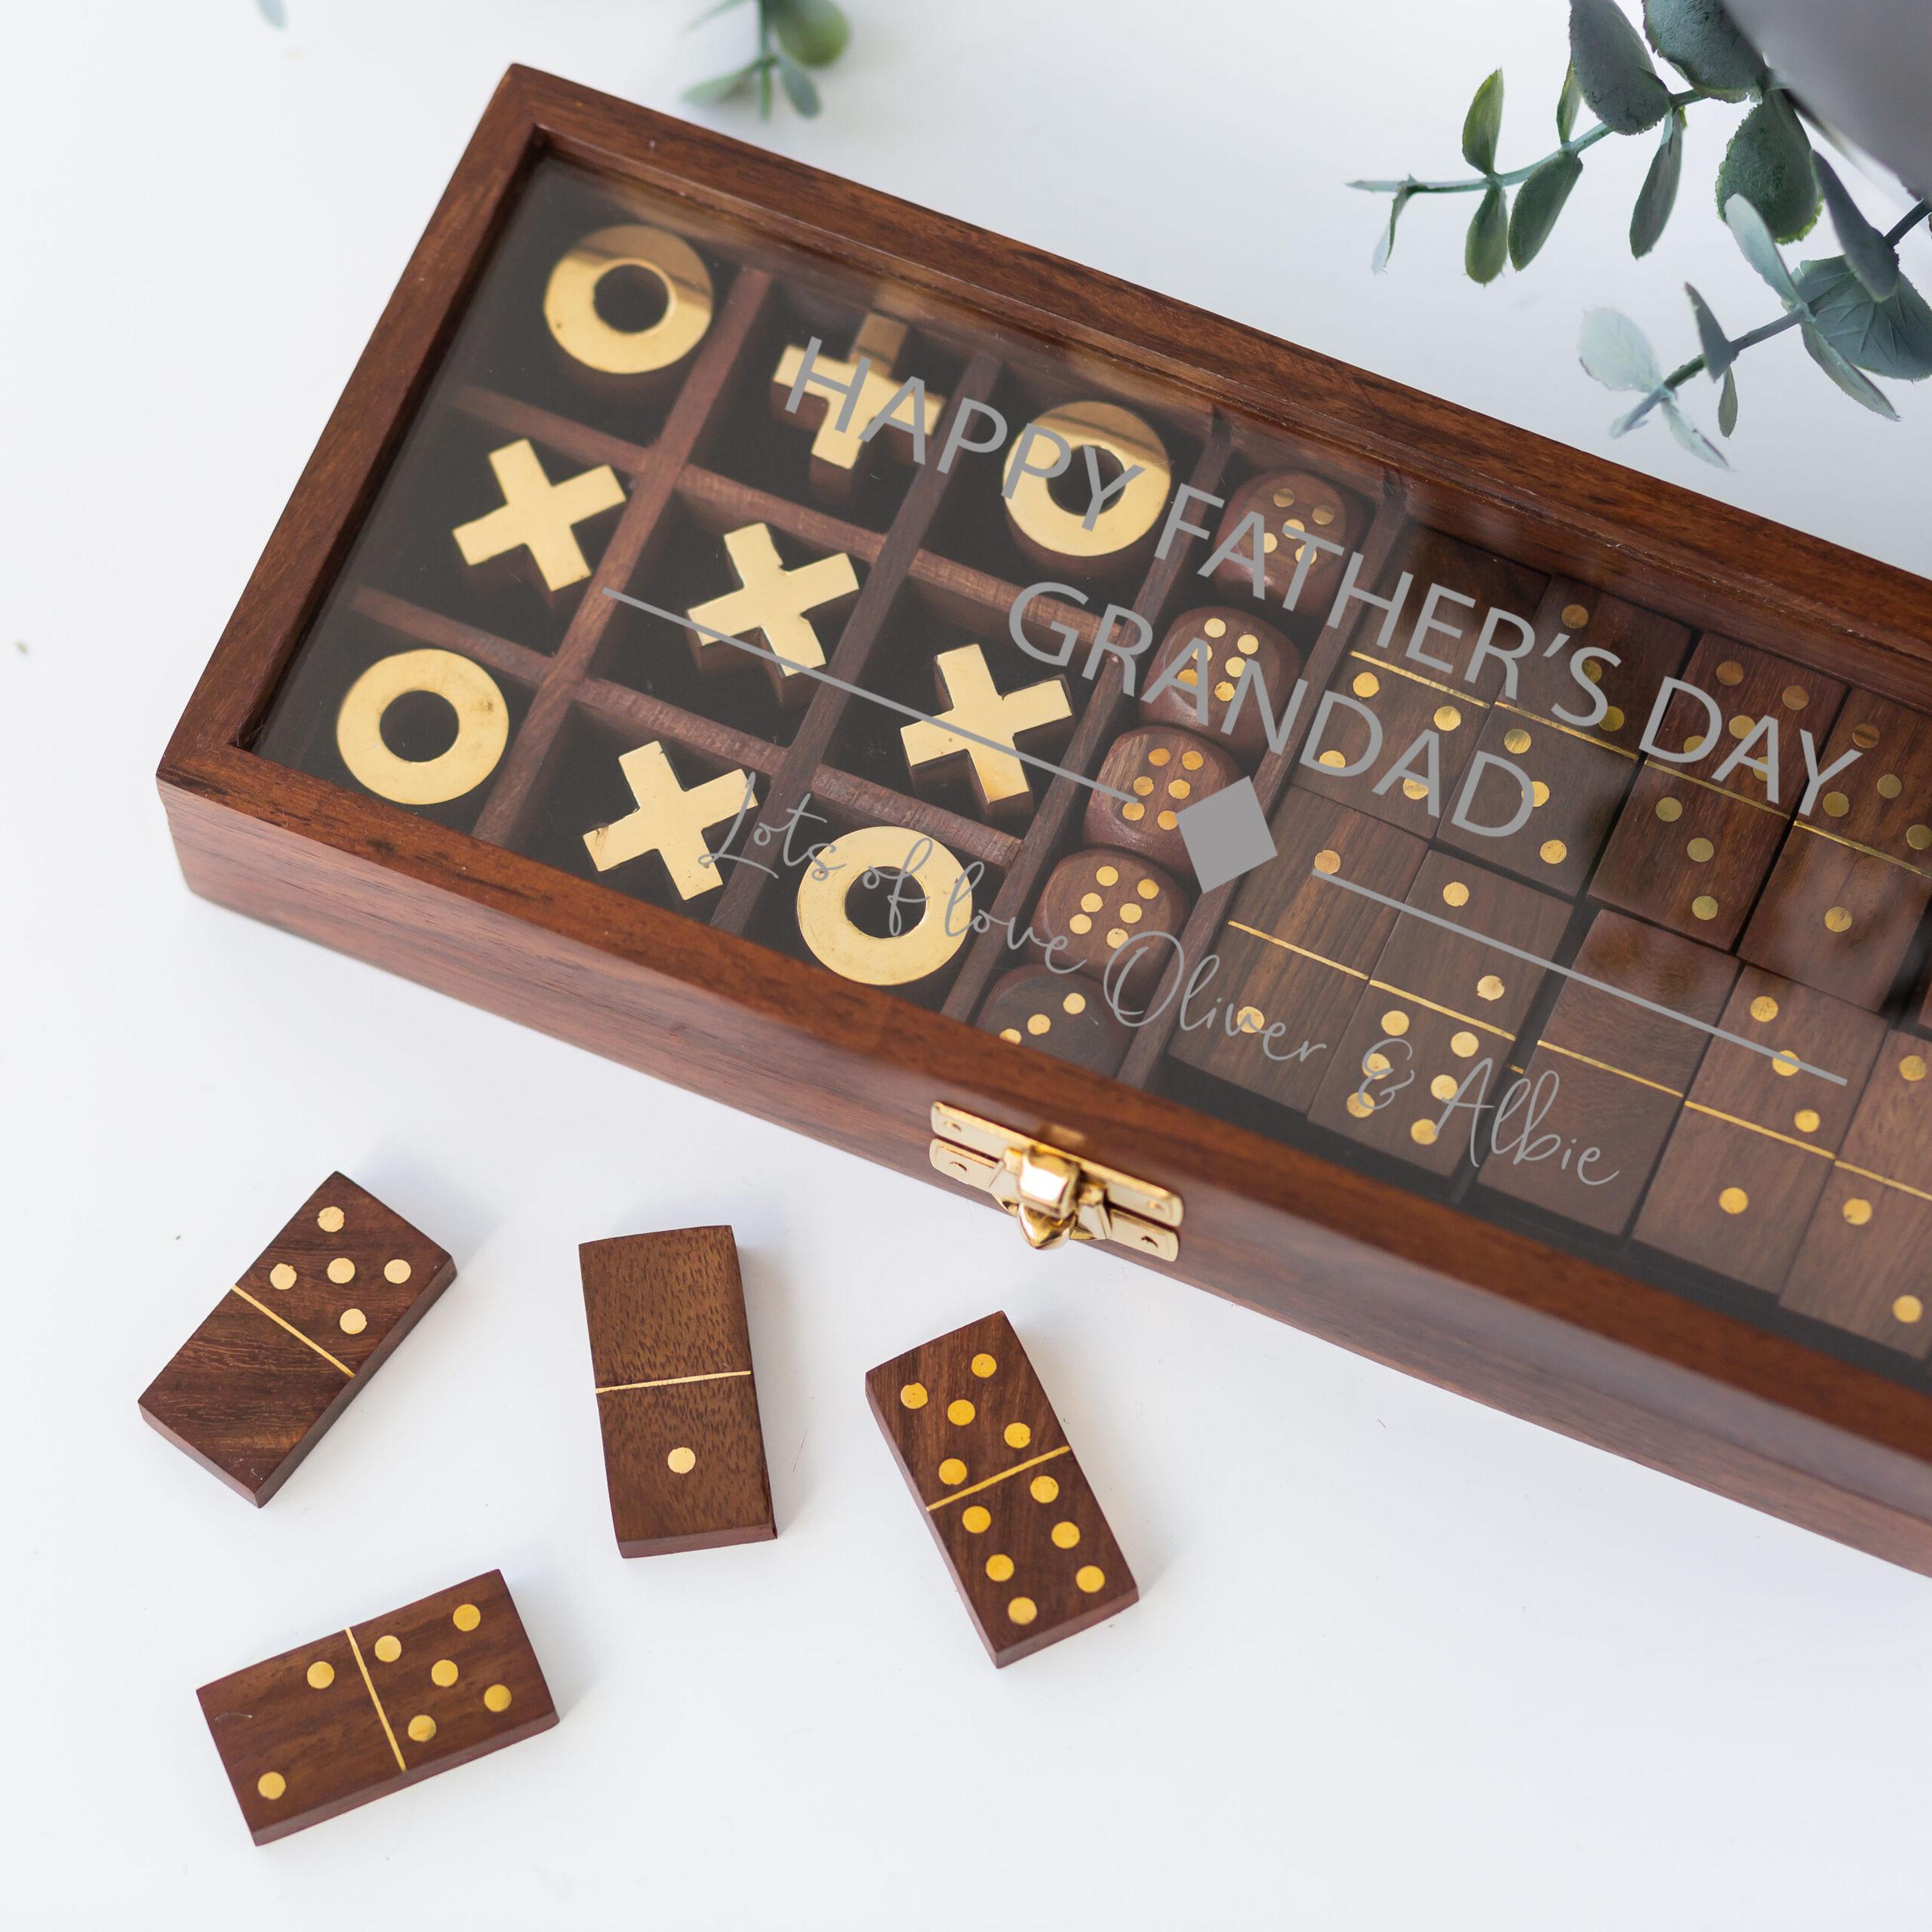 Personalised Wooden Dominoes, Dice & Tic Tac Toe Box